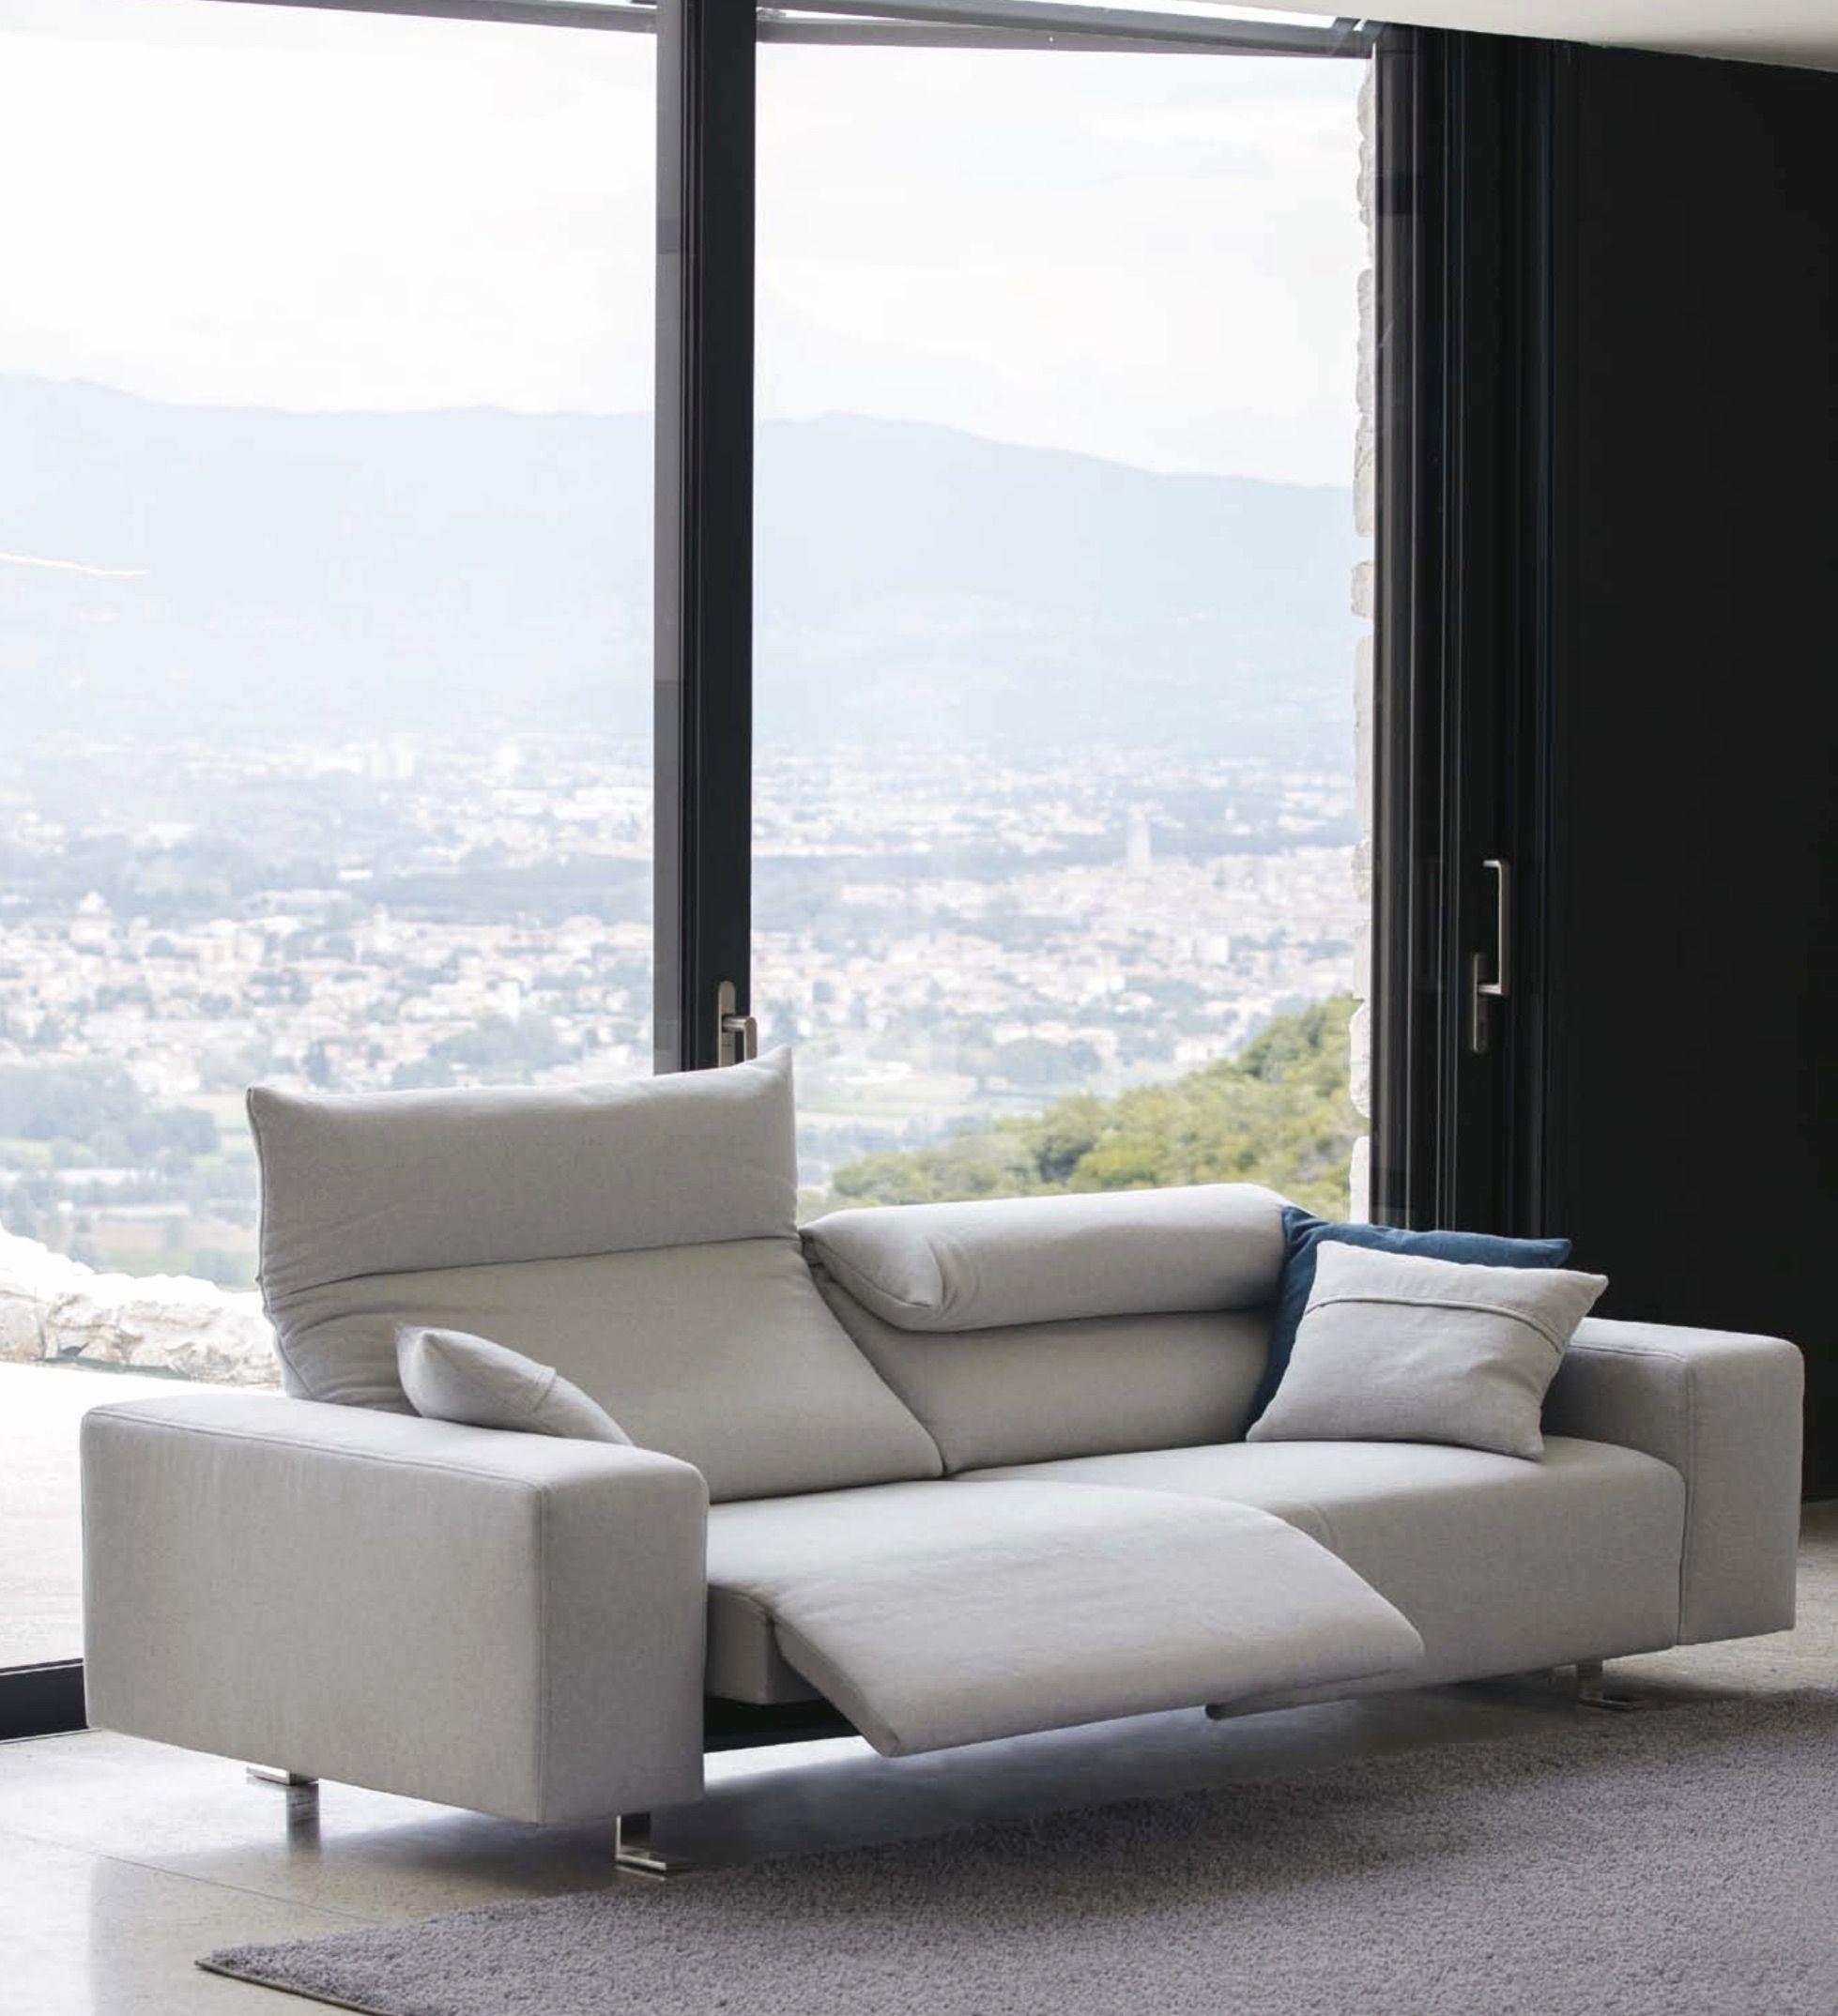 Awesome Modern sofa Designs Photos italian sofas at momentoitalia ...